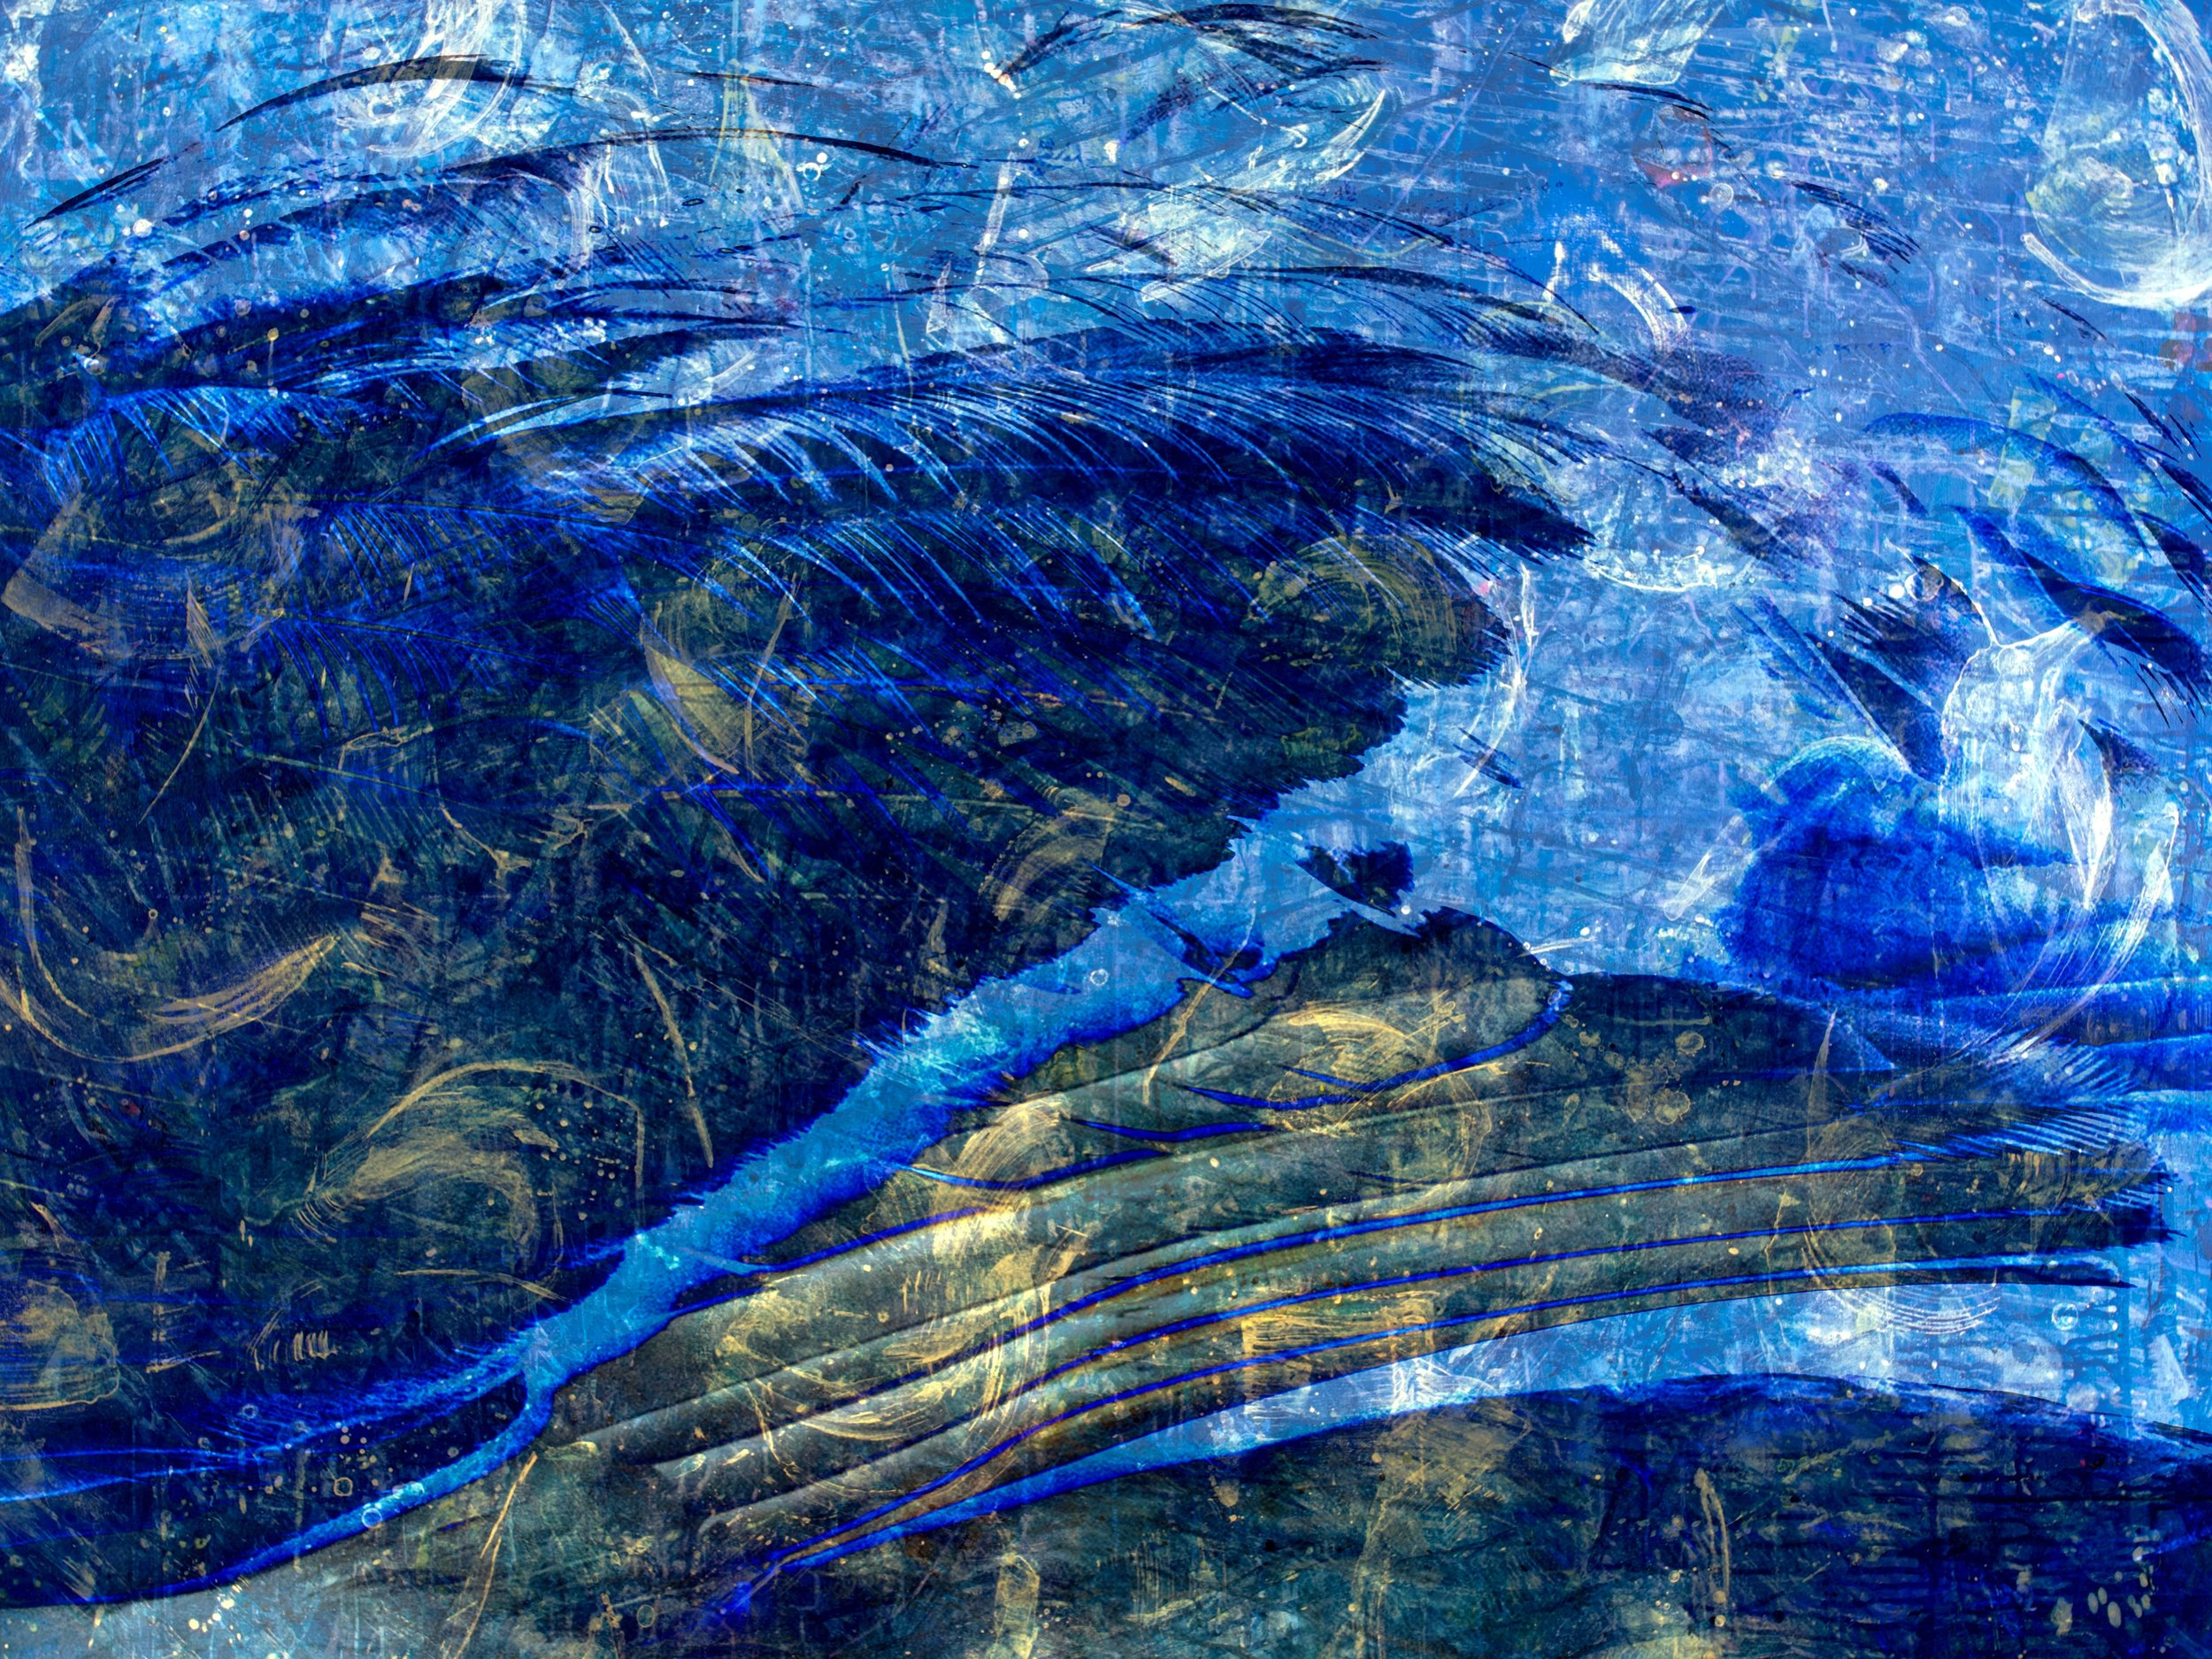 Blue Swan, Nantucket